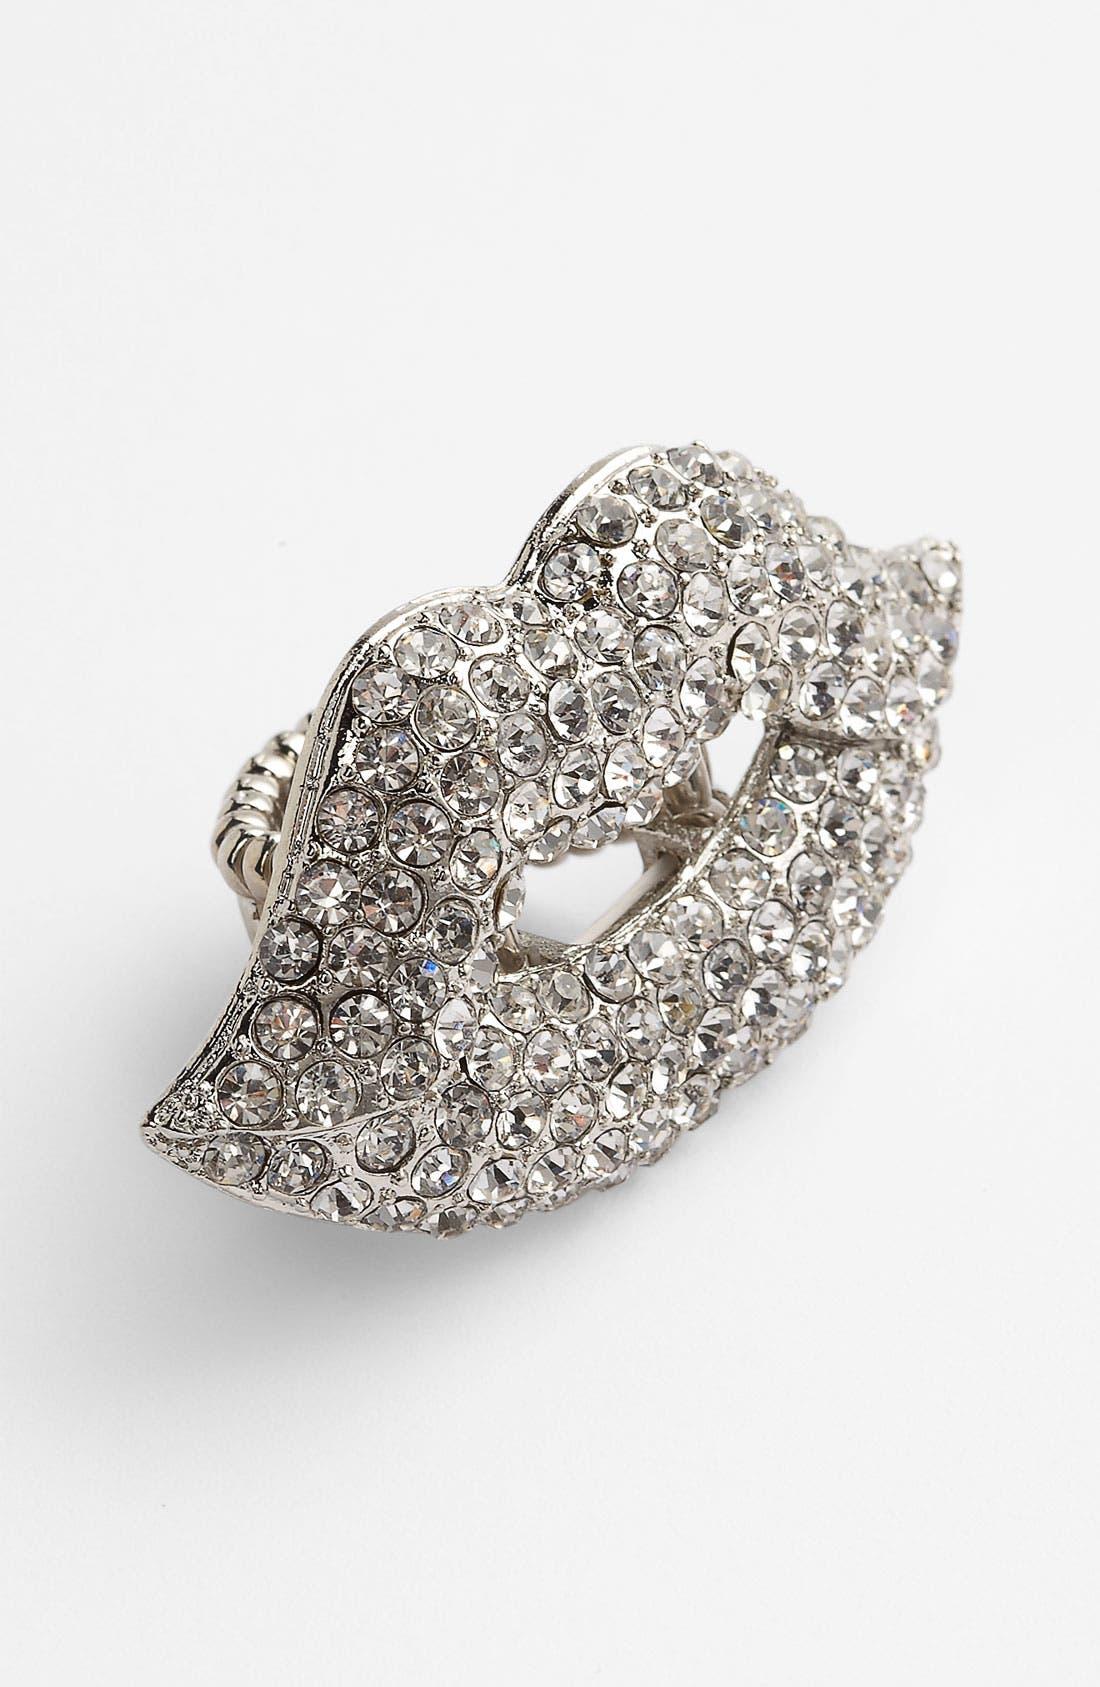 Main Image - Natasha Couture 'Lip' Ring